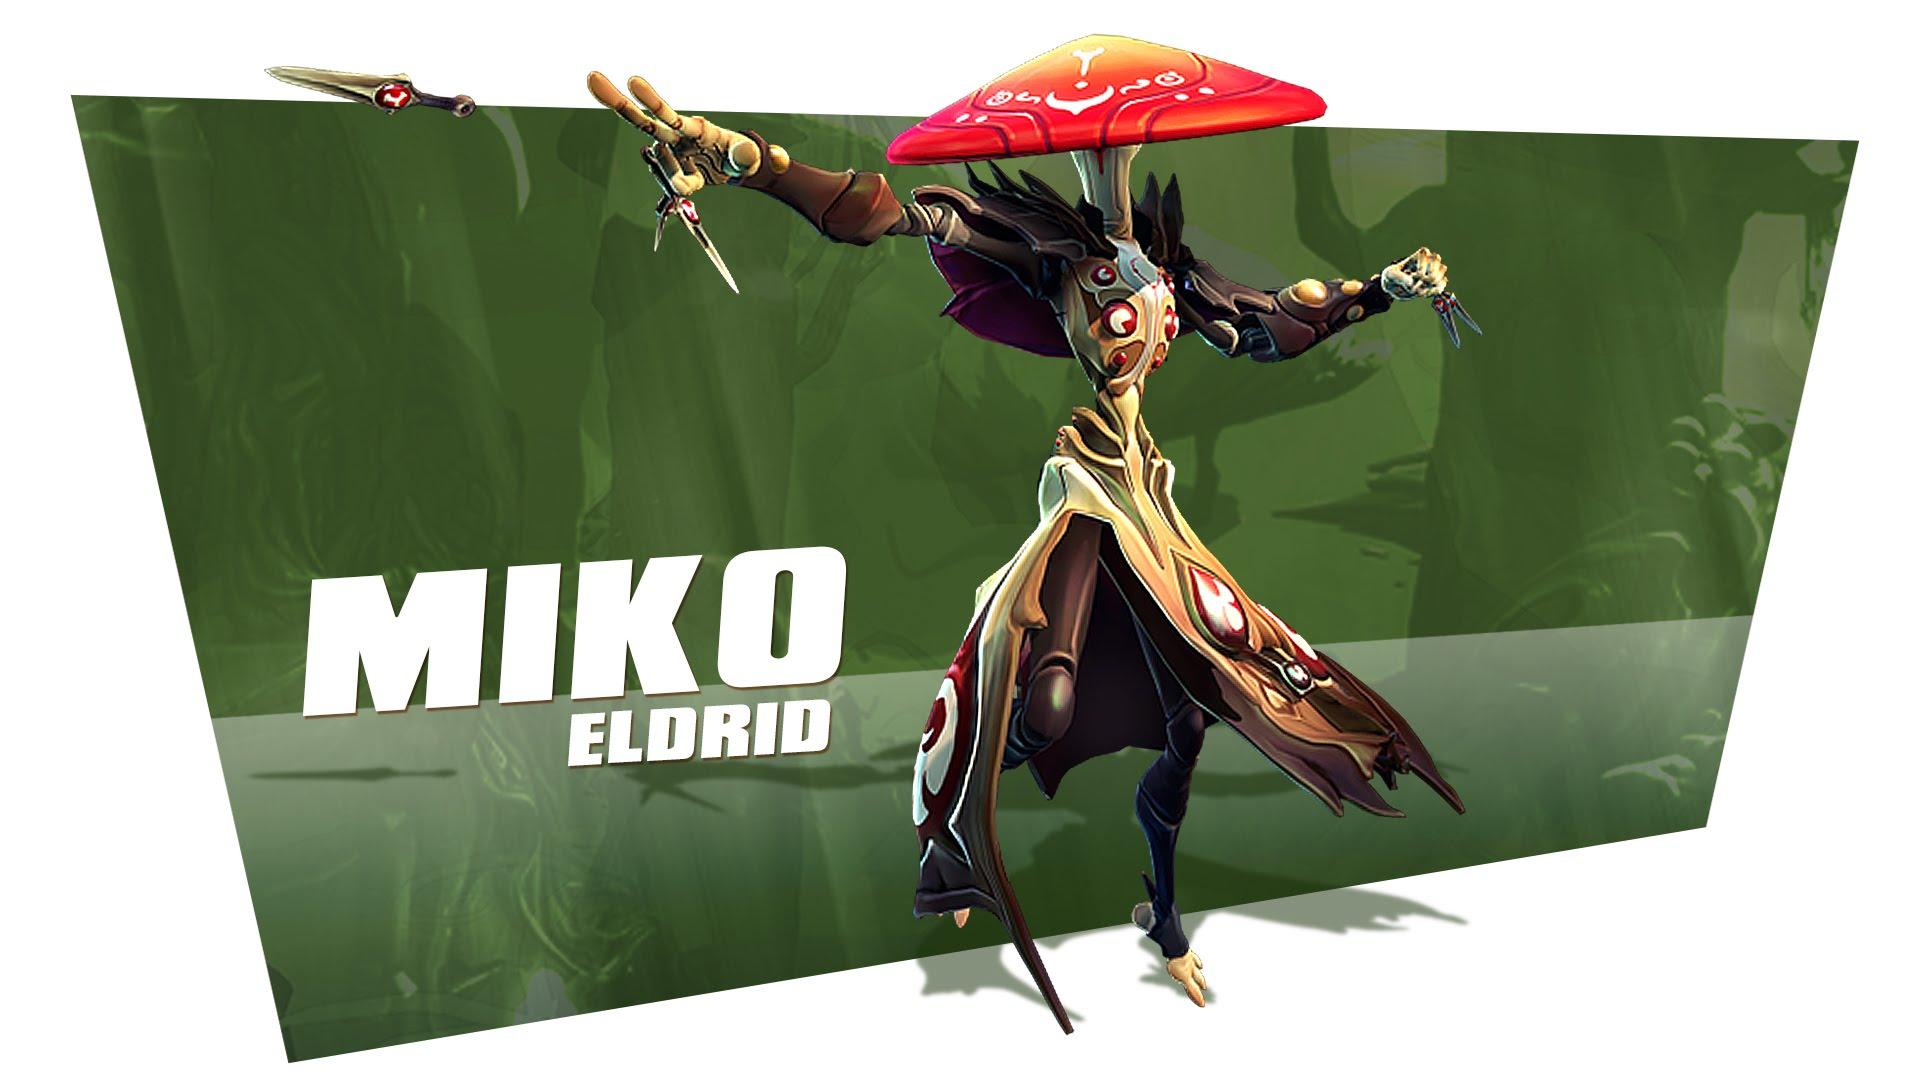 Miko, the healer from Battleborn